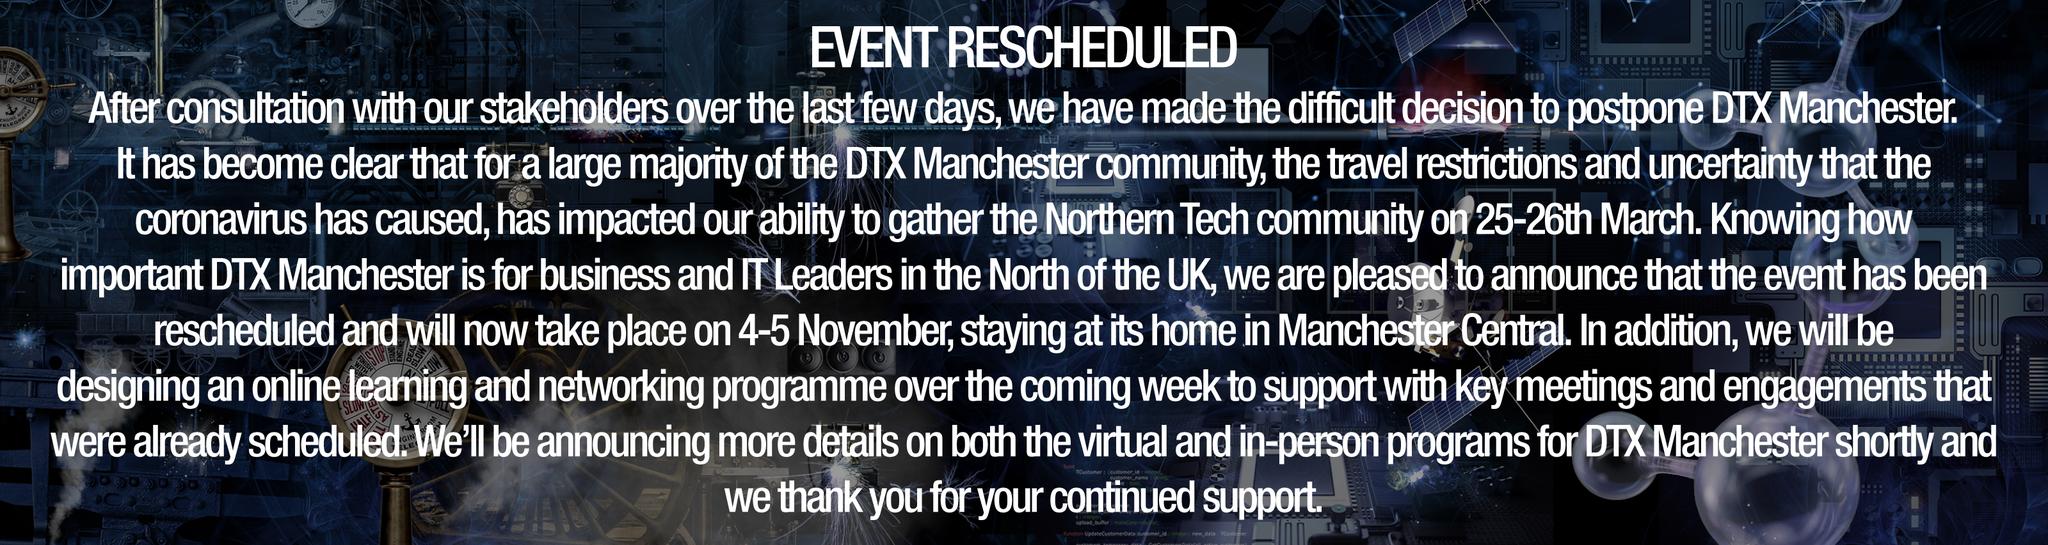 Event Rescheduled